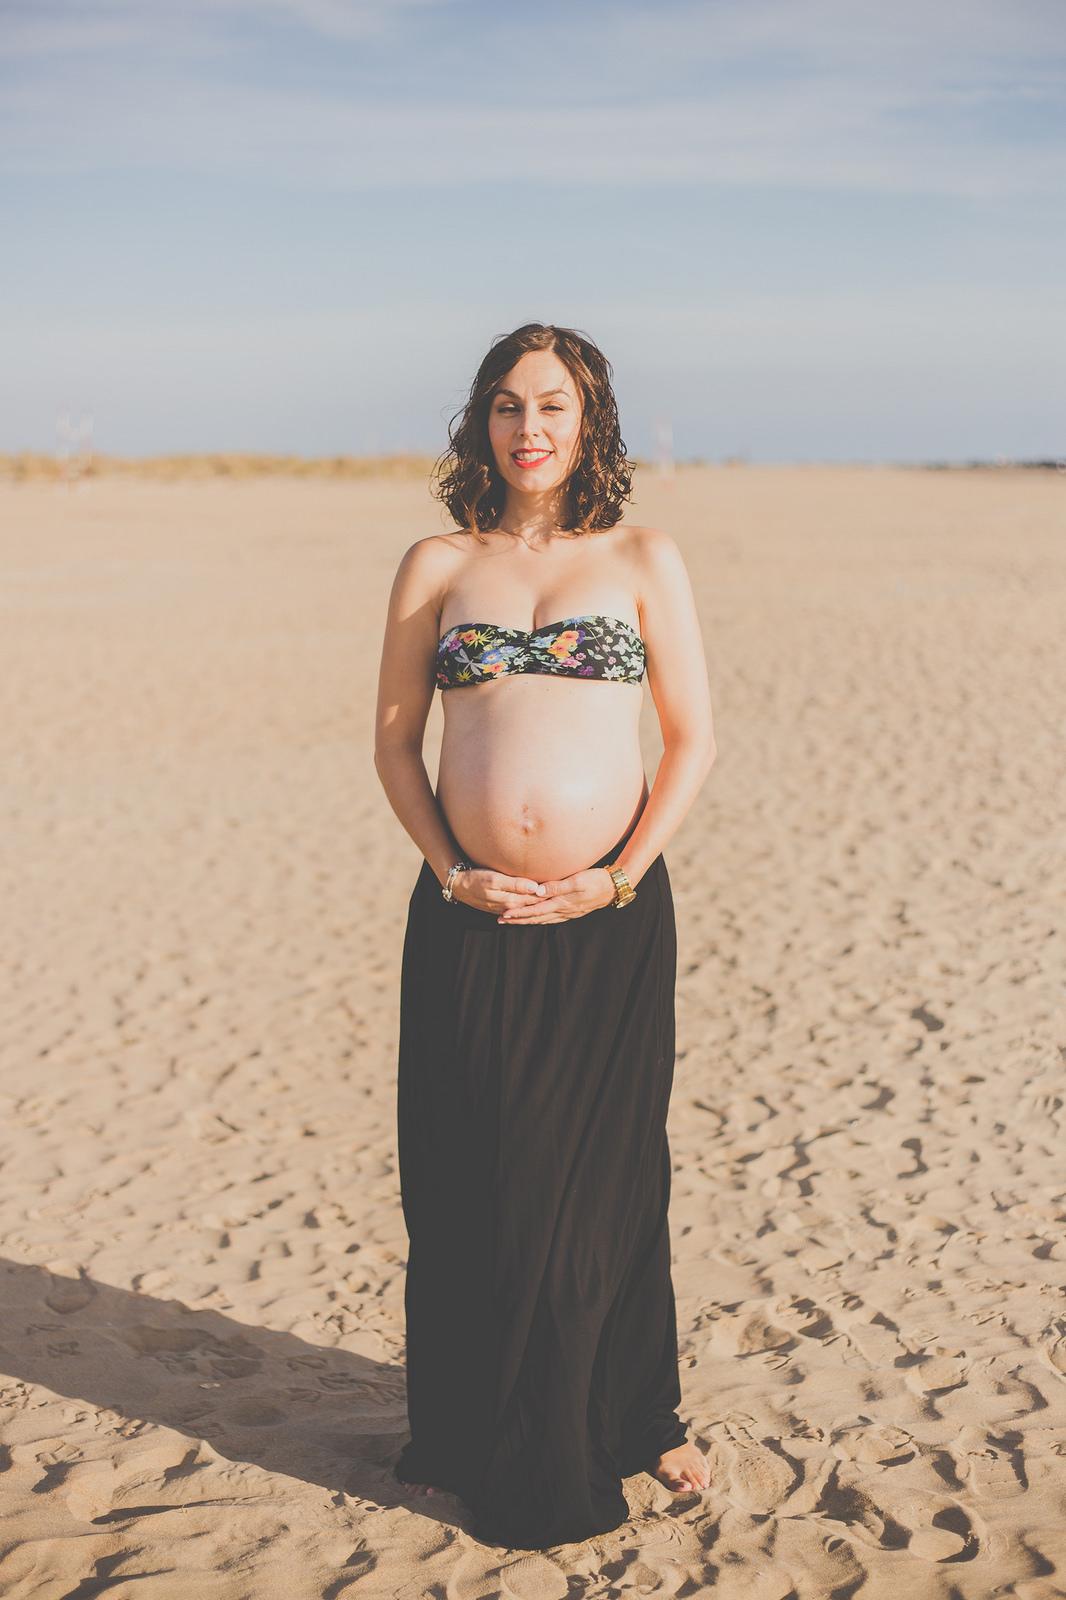 sesion embarazo silvia orduna fotografia huelva playa 23